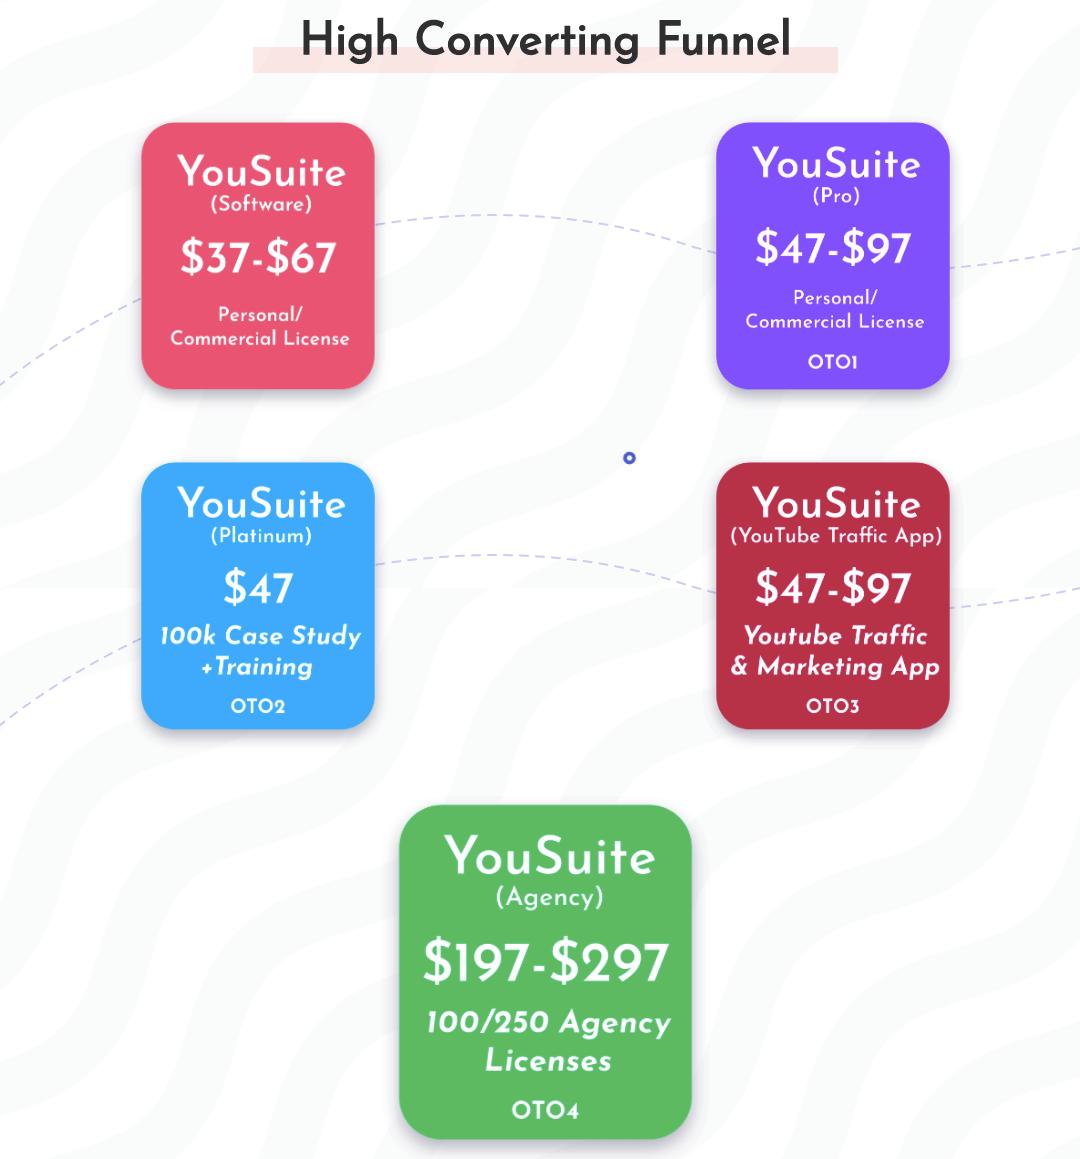 YouSuite-Funnels